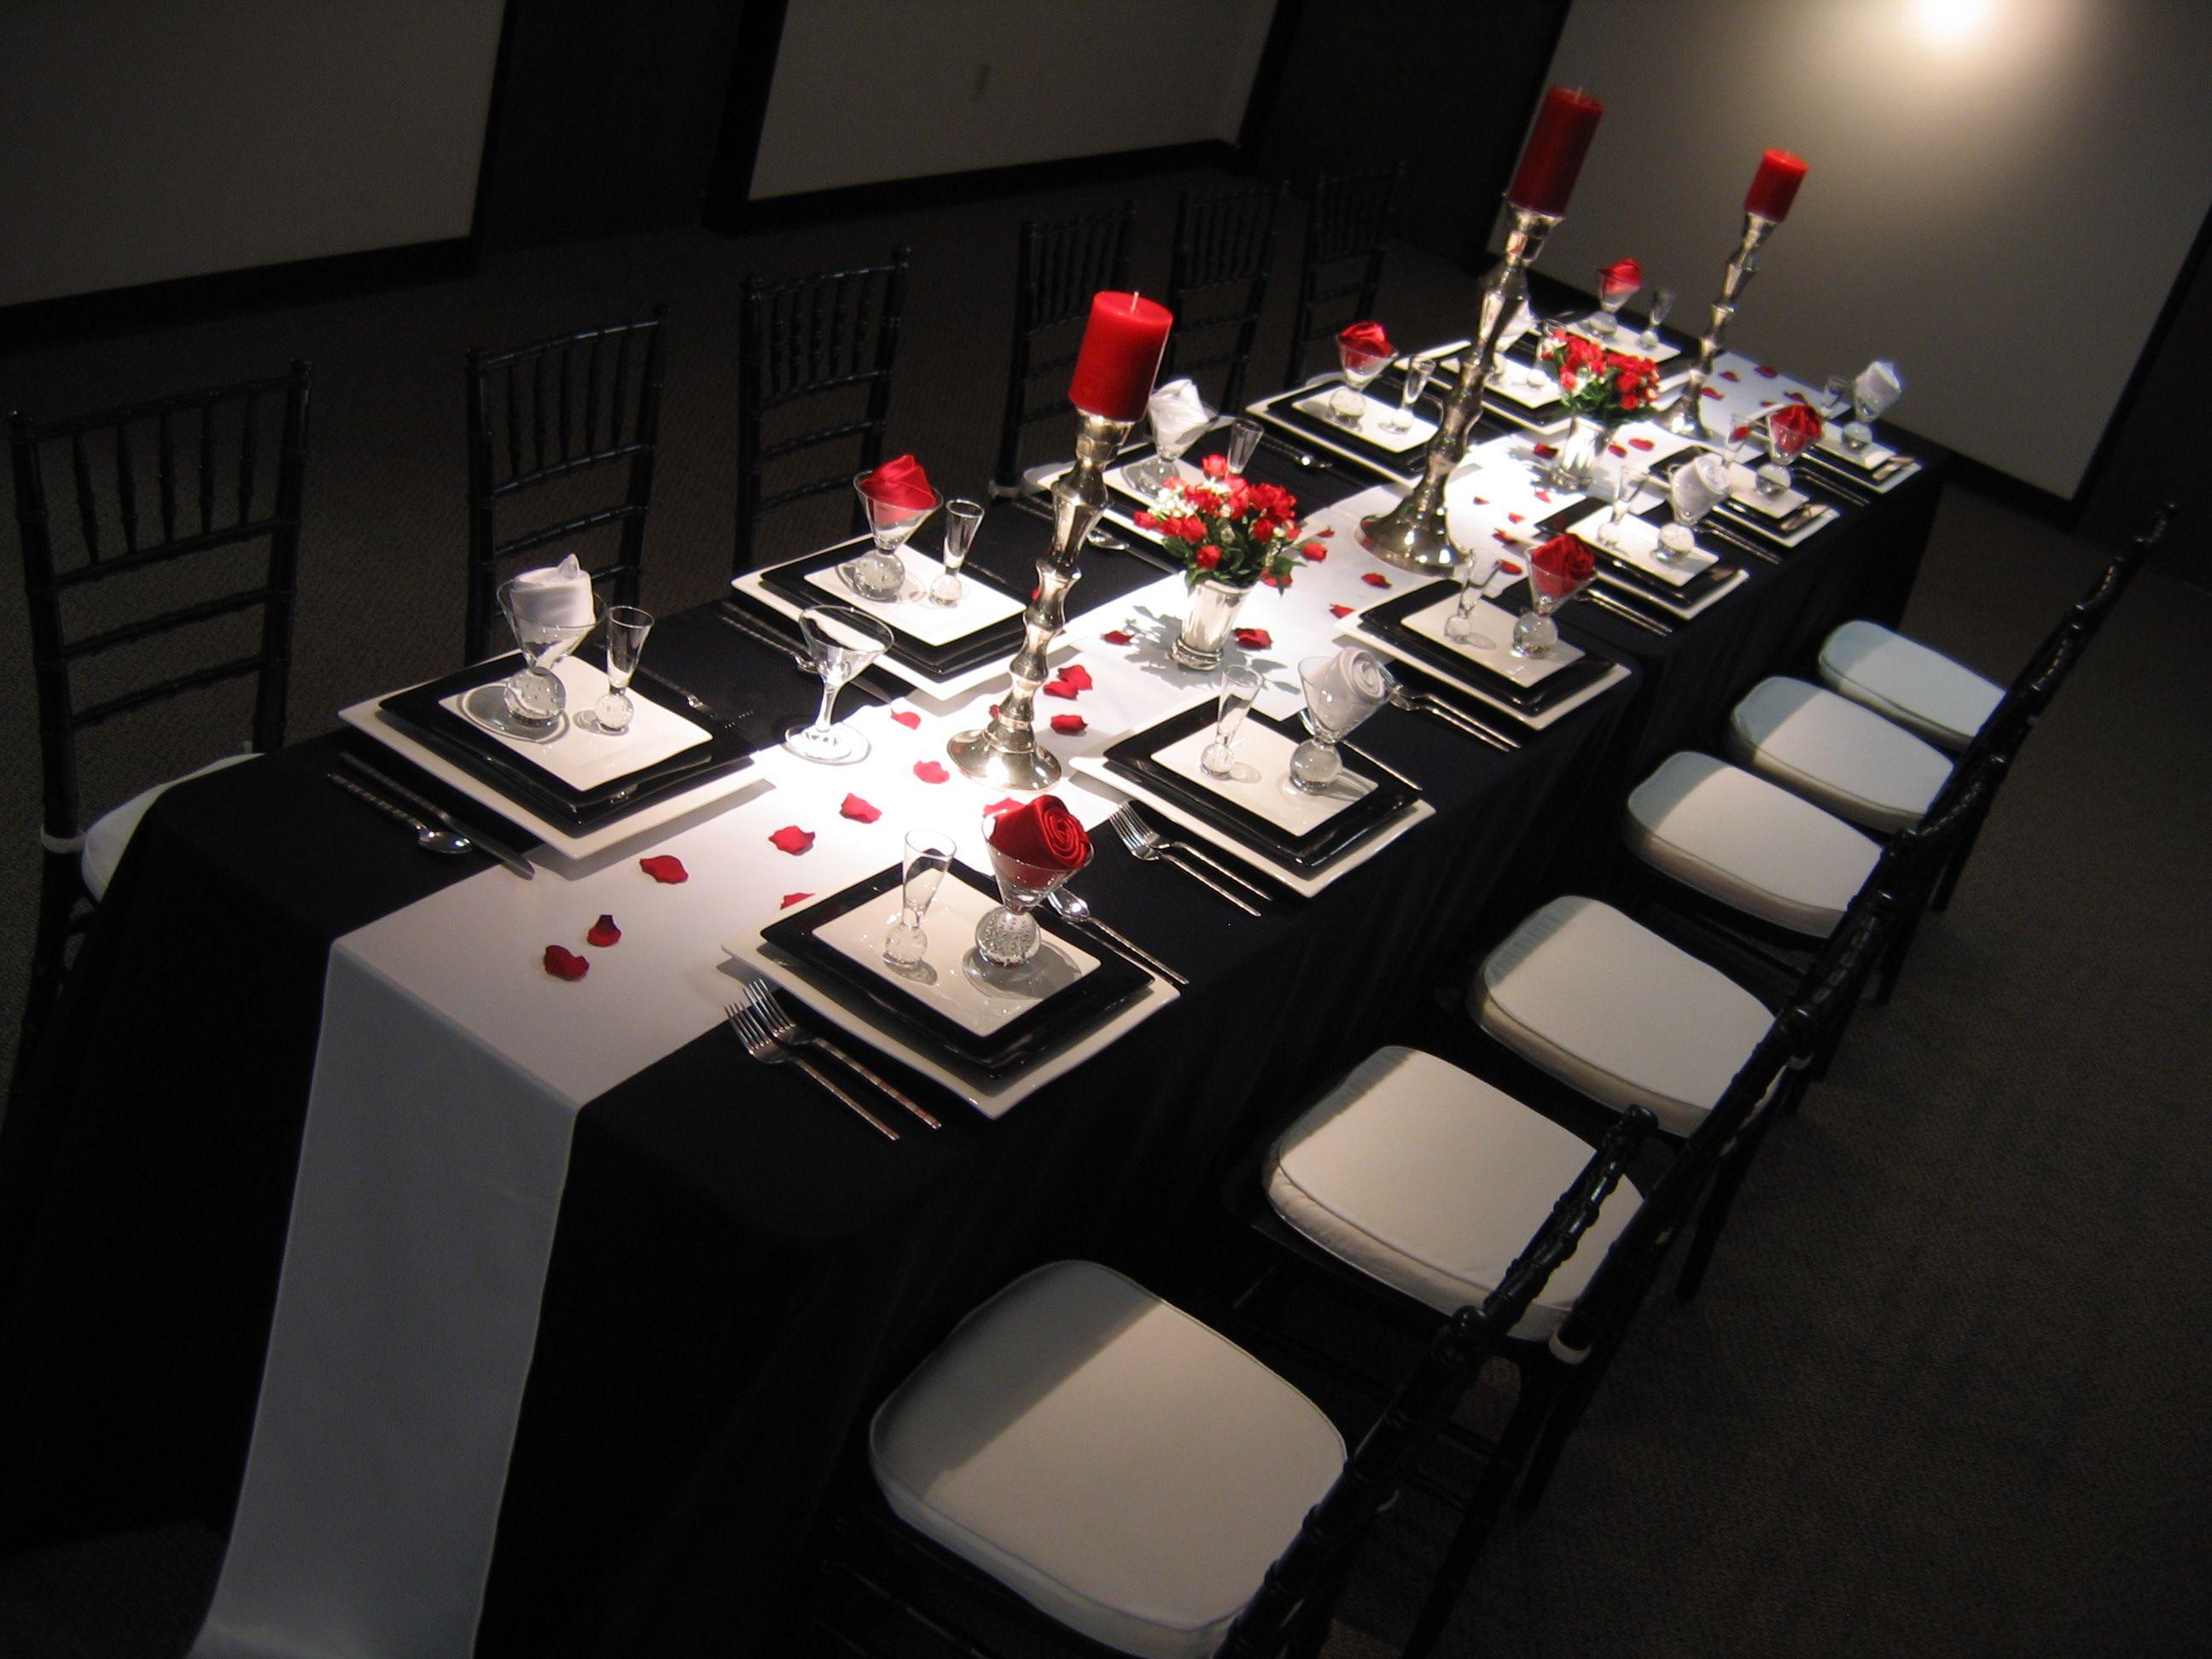 Black and white wedding decor ideas  silver wedding anniversary decorating ideas  red black and white